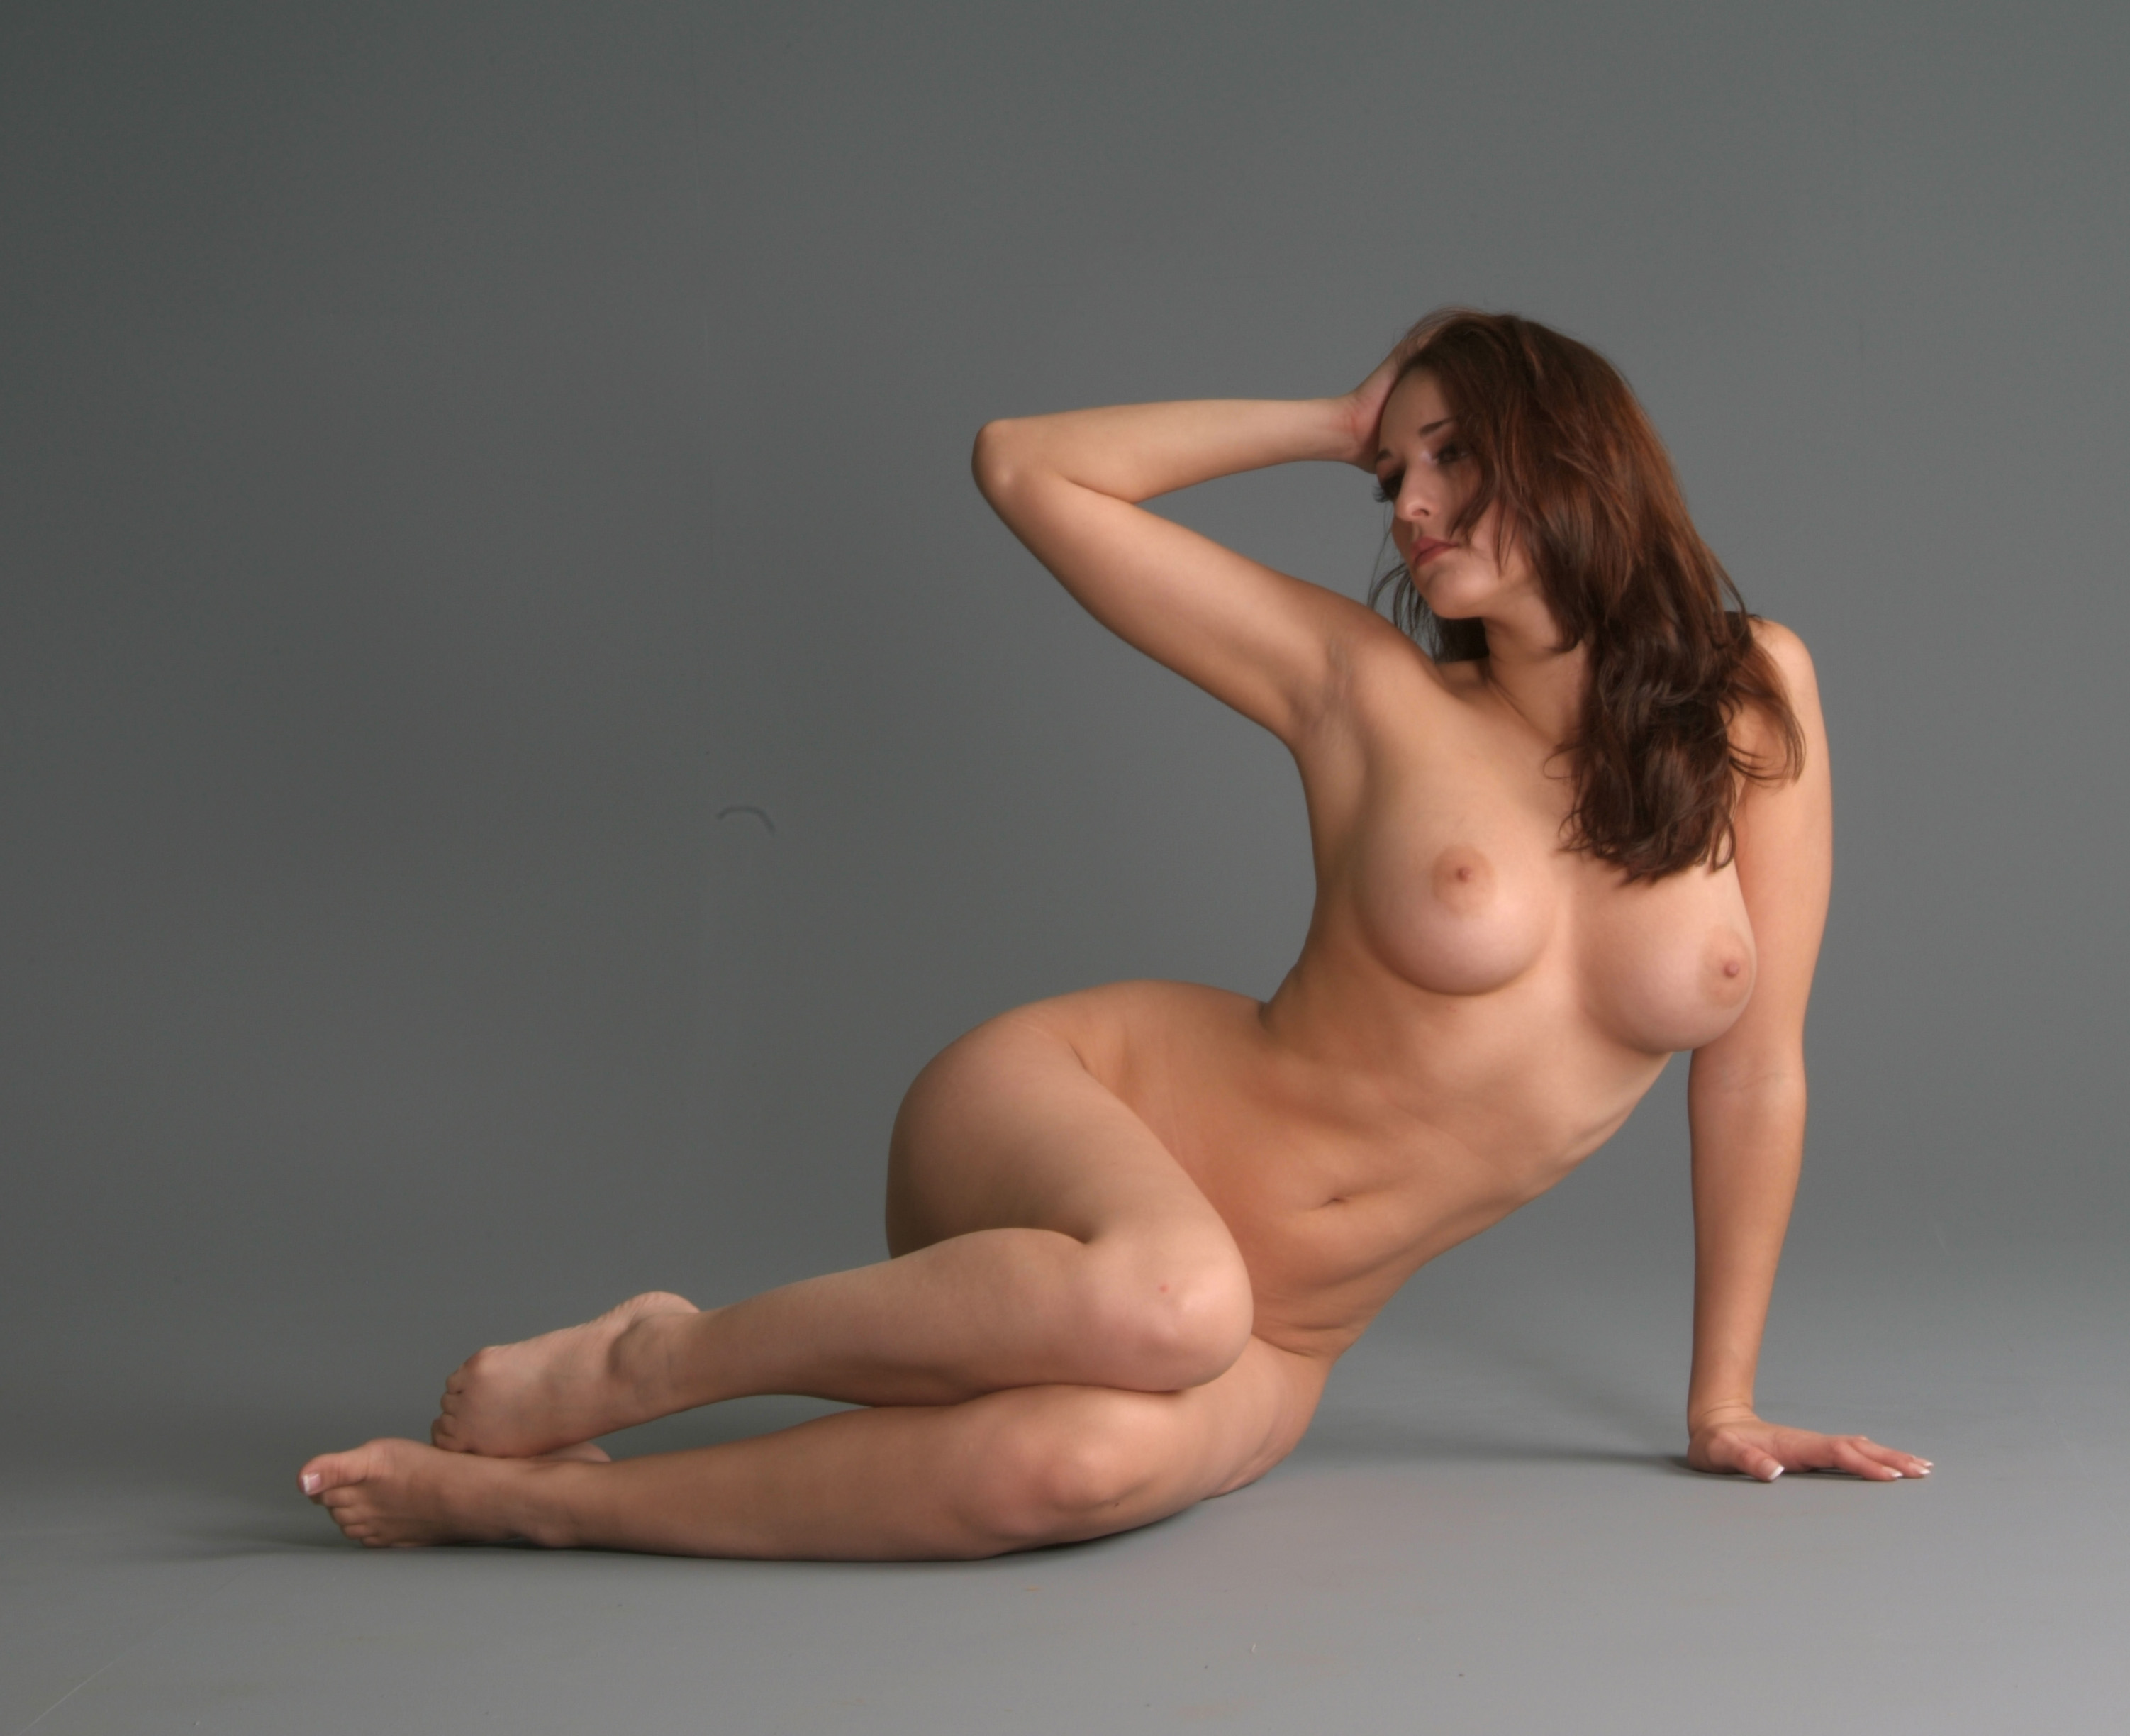 Hot ex girls nude — 14